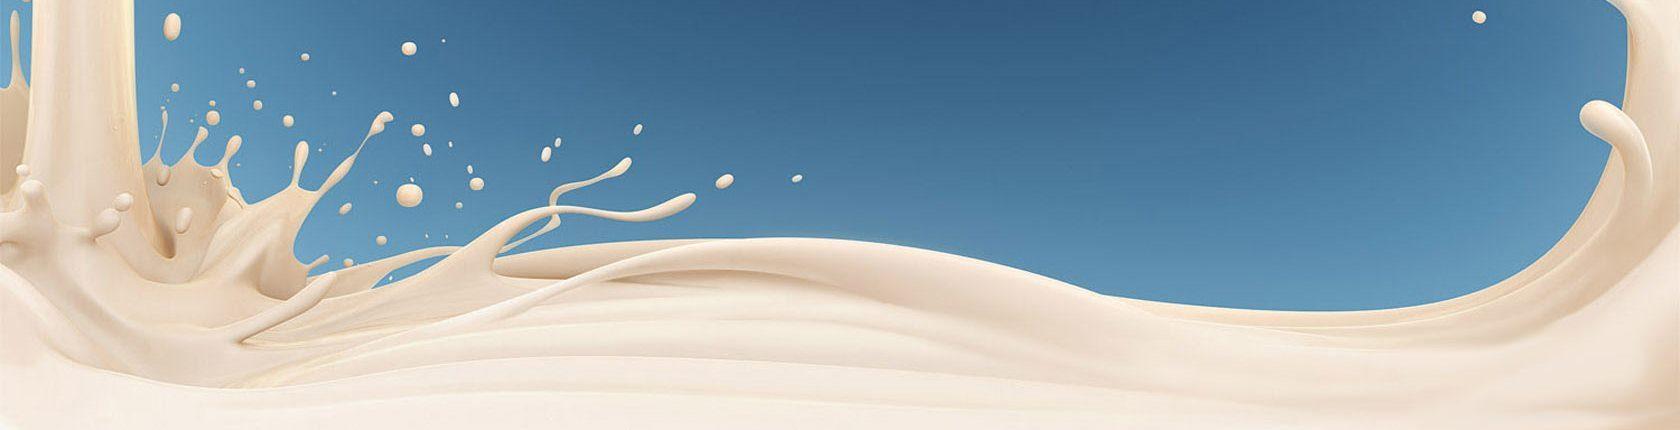 Milk_River3